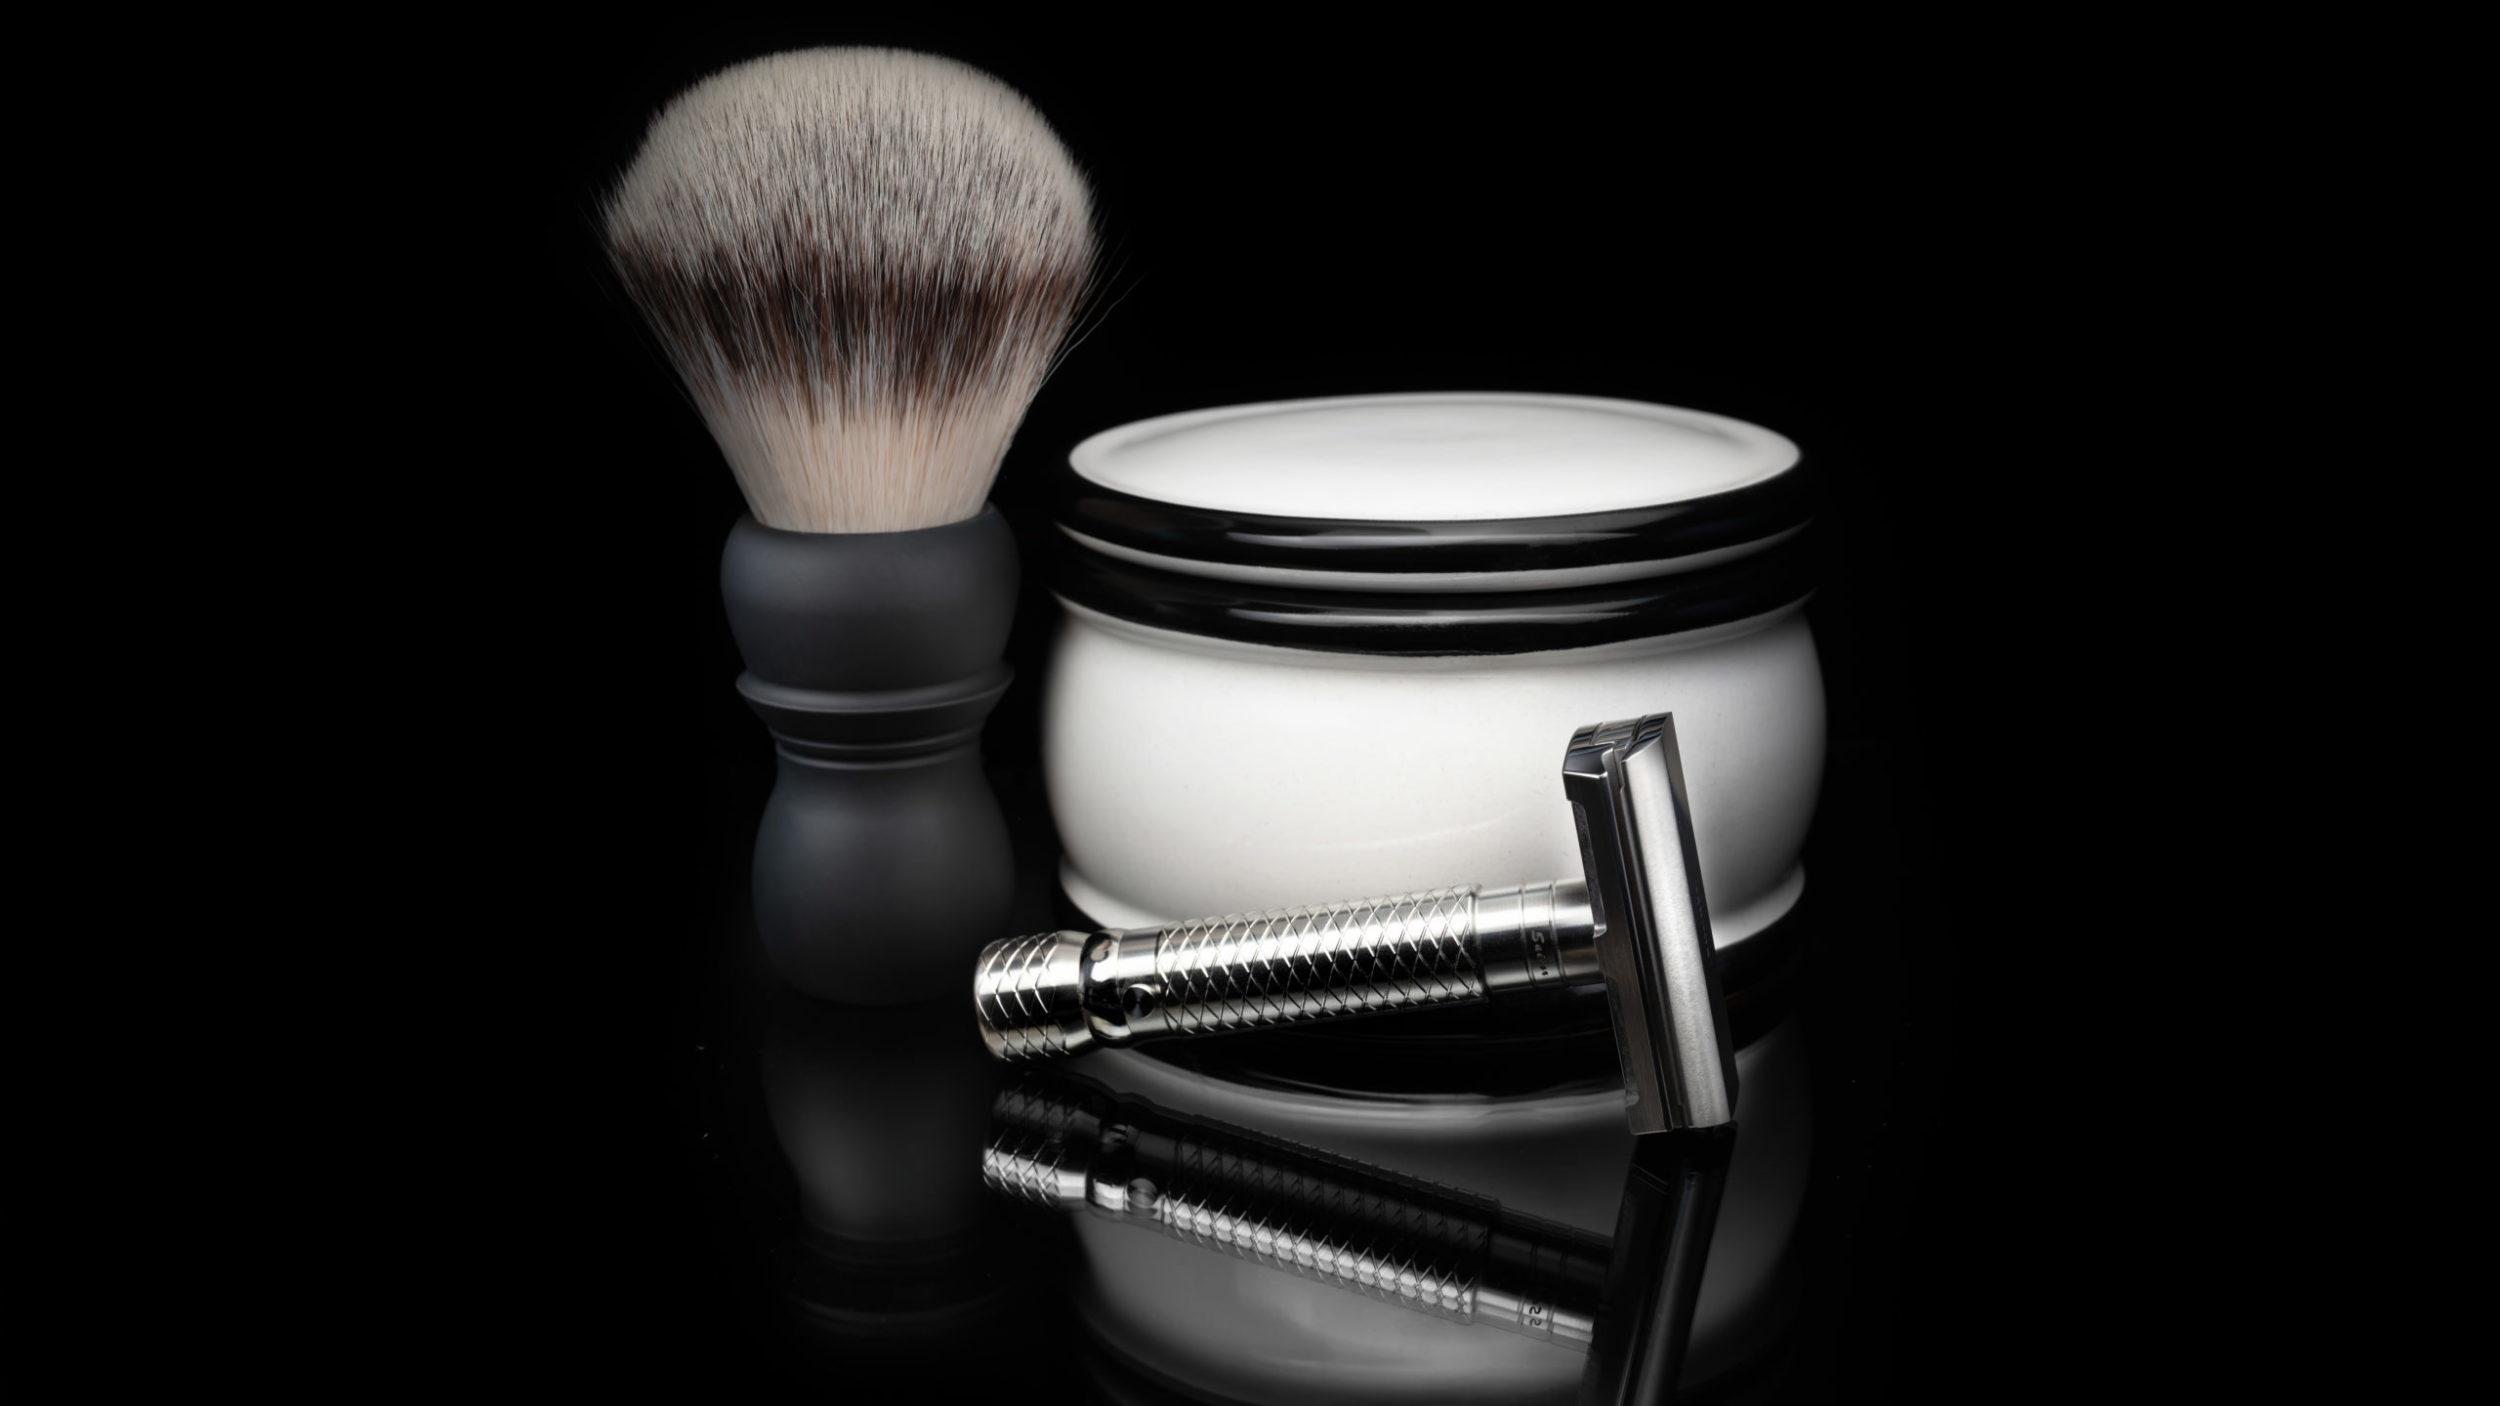 The Shaving Dutchman